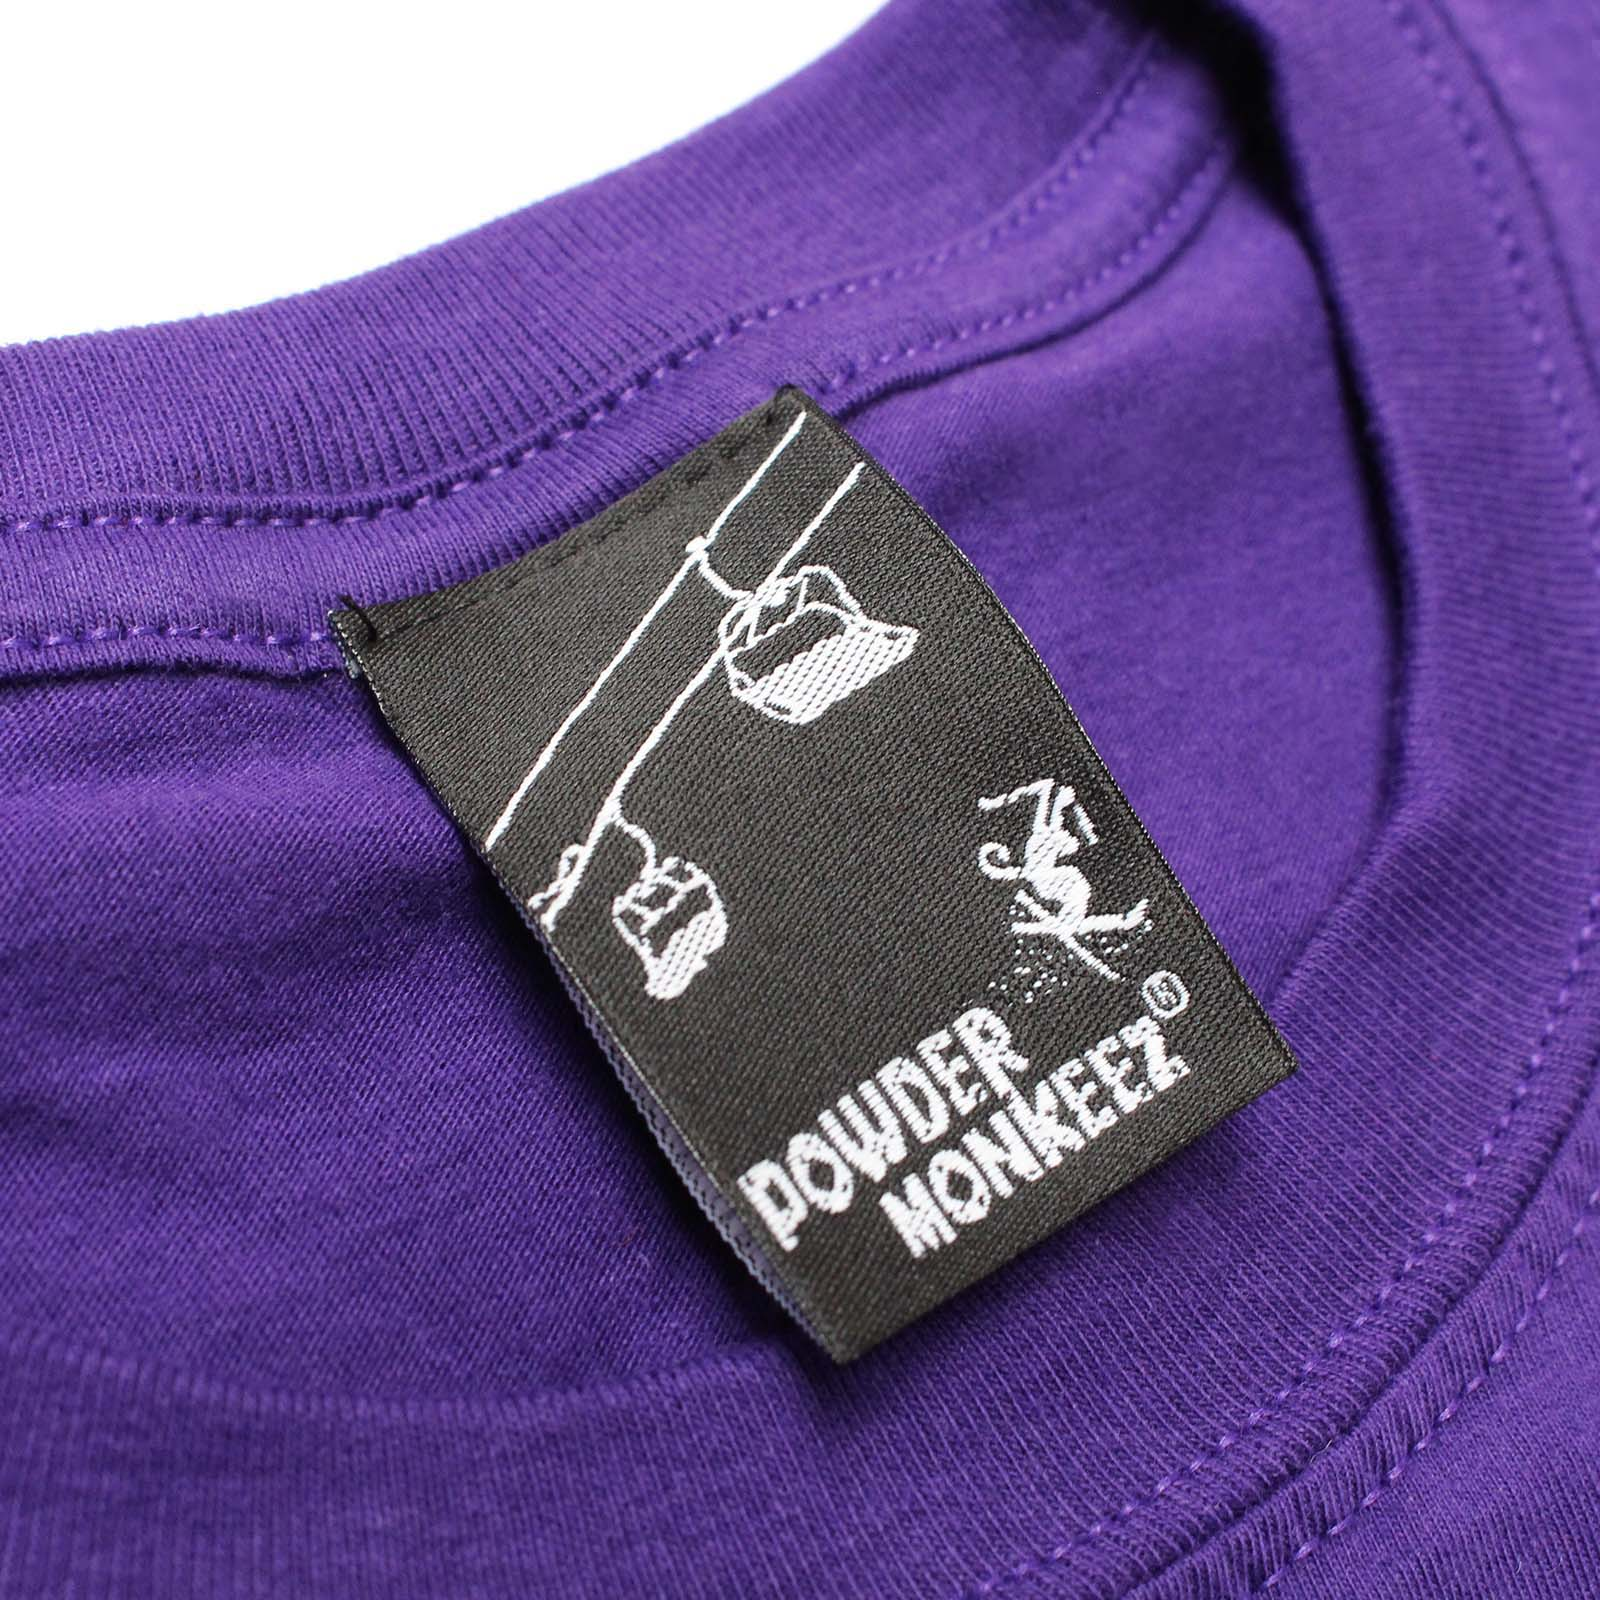 Ski Tee Lifes a MOUNTAIN FUNNY Top anniversaire Tee pour lui T Shirt T-Shirt